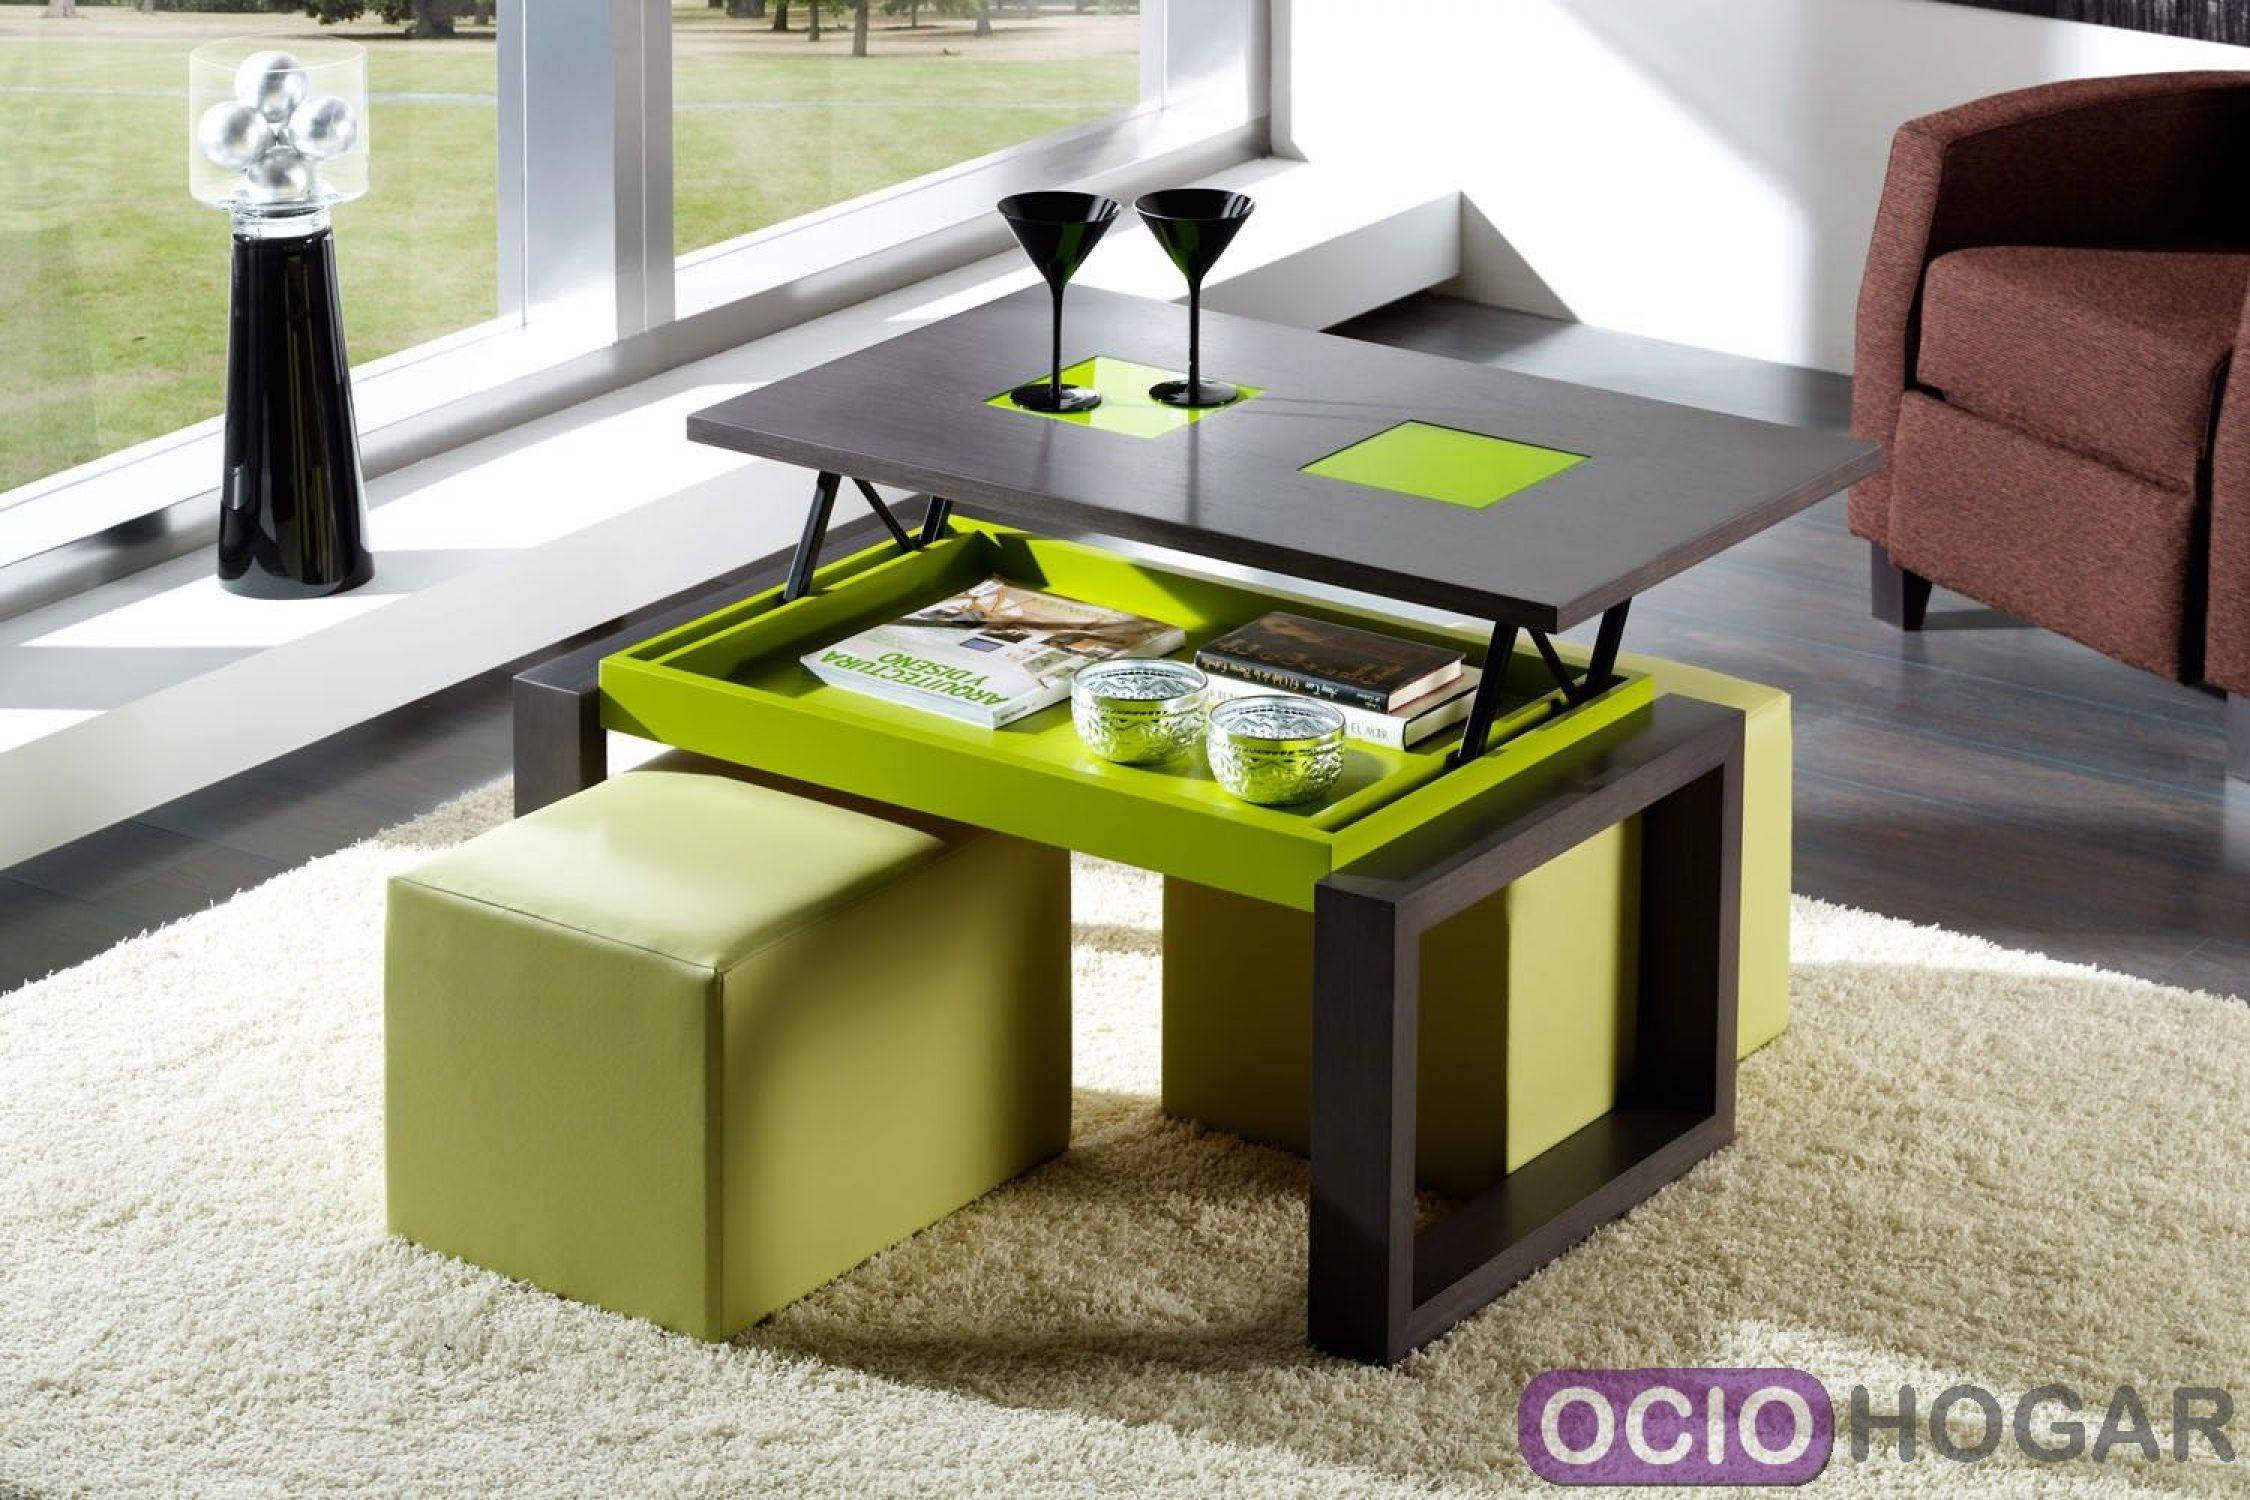 Ociohogar mesa de centro elevable roth de dissery - Mesas salon elevables ...